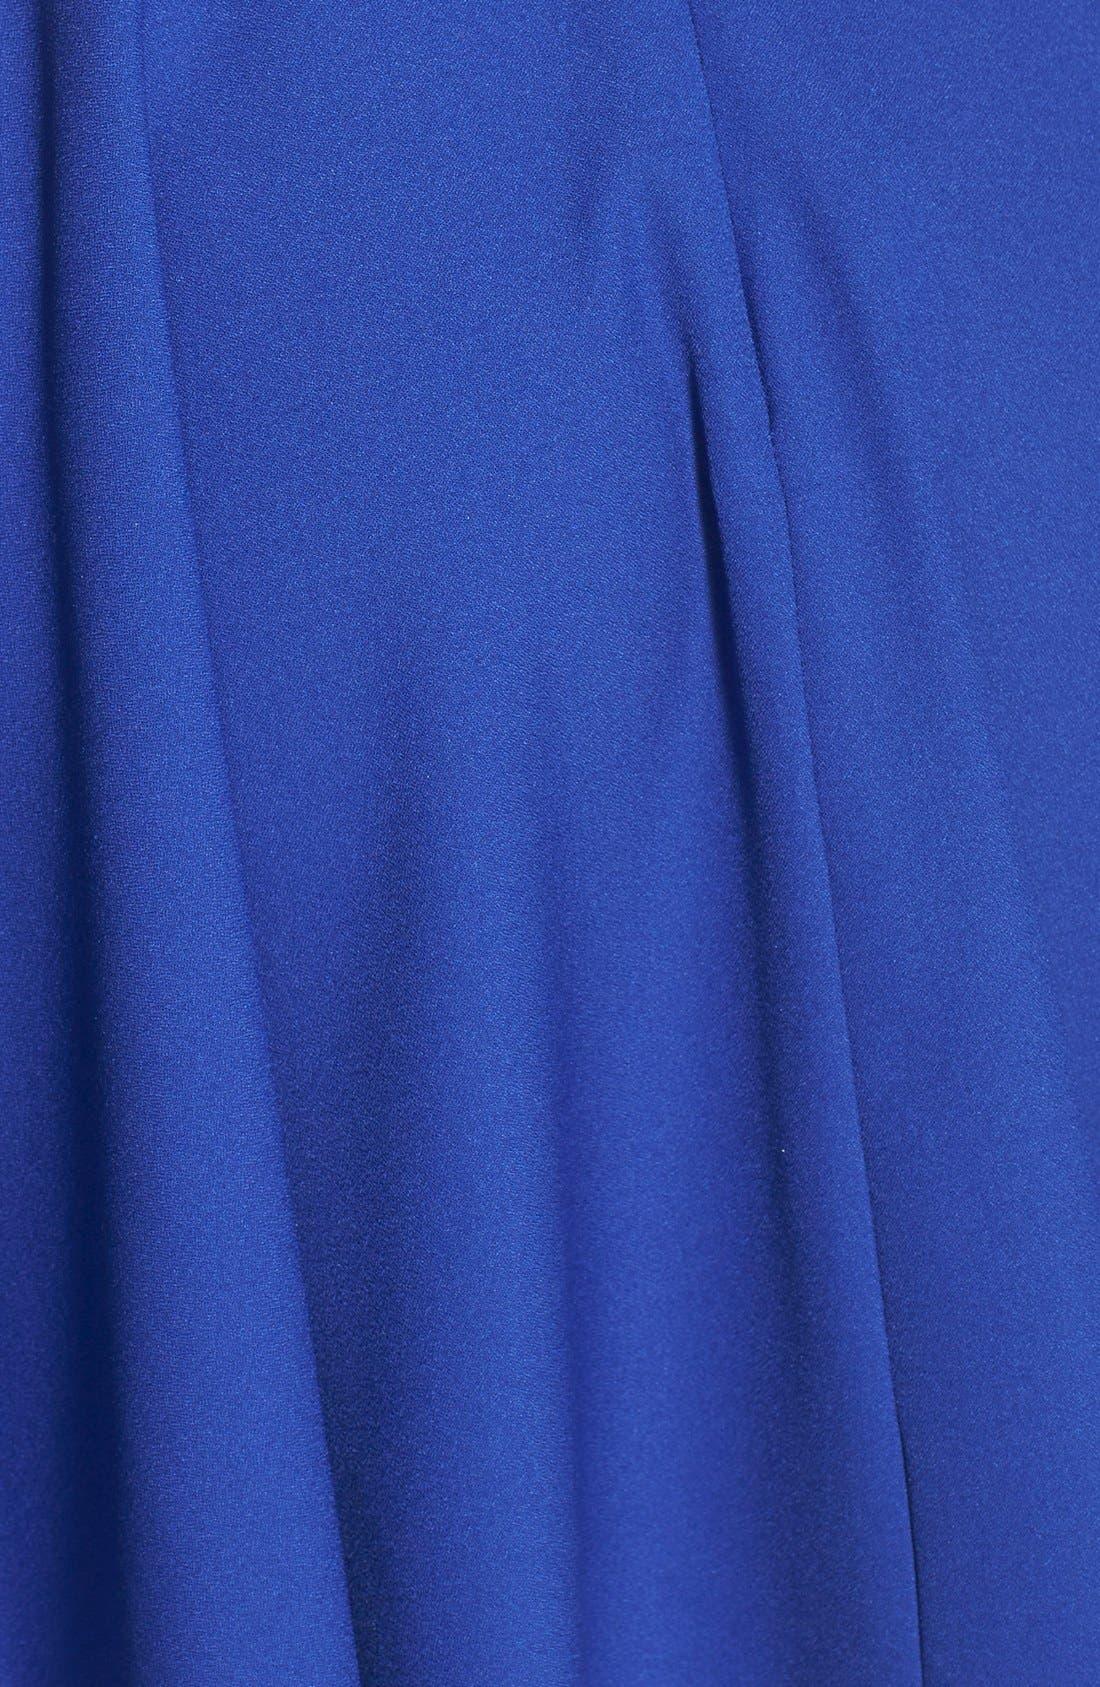 Alternate Image 3  - Cream and Sugar Lace Trim Cutout Skater Dress (Juniors)